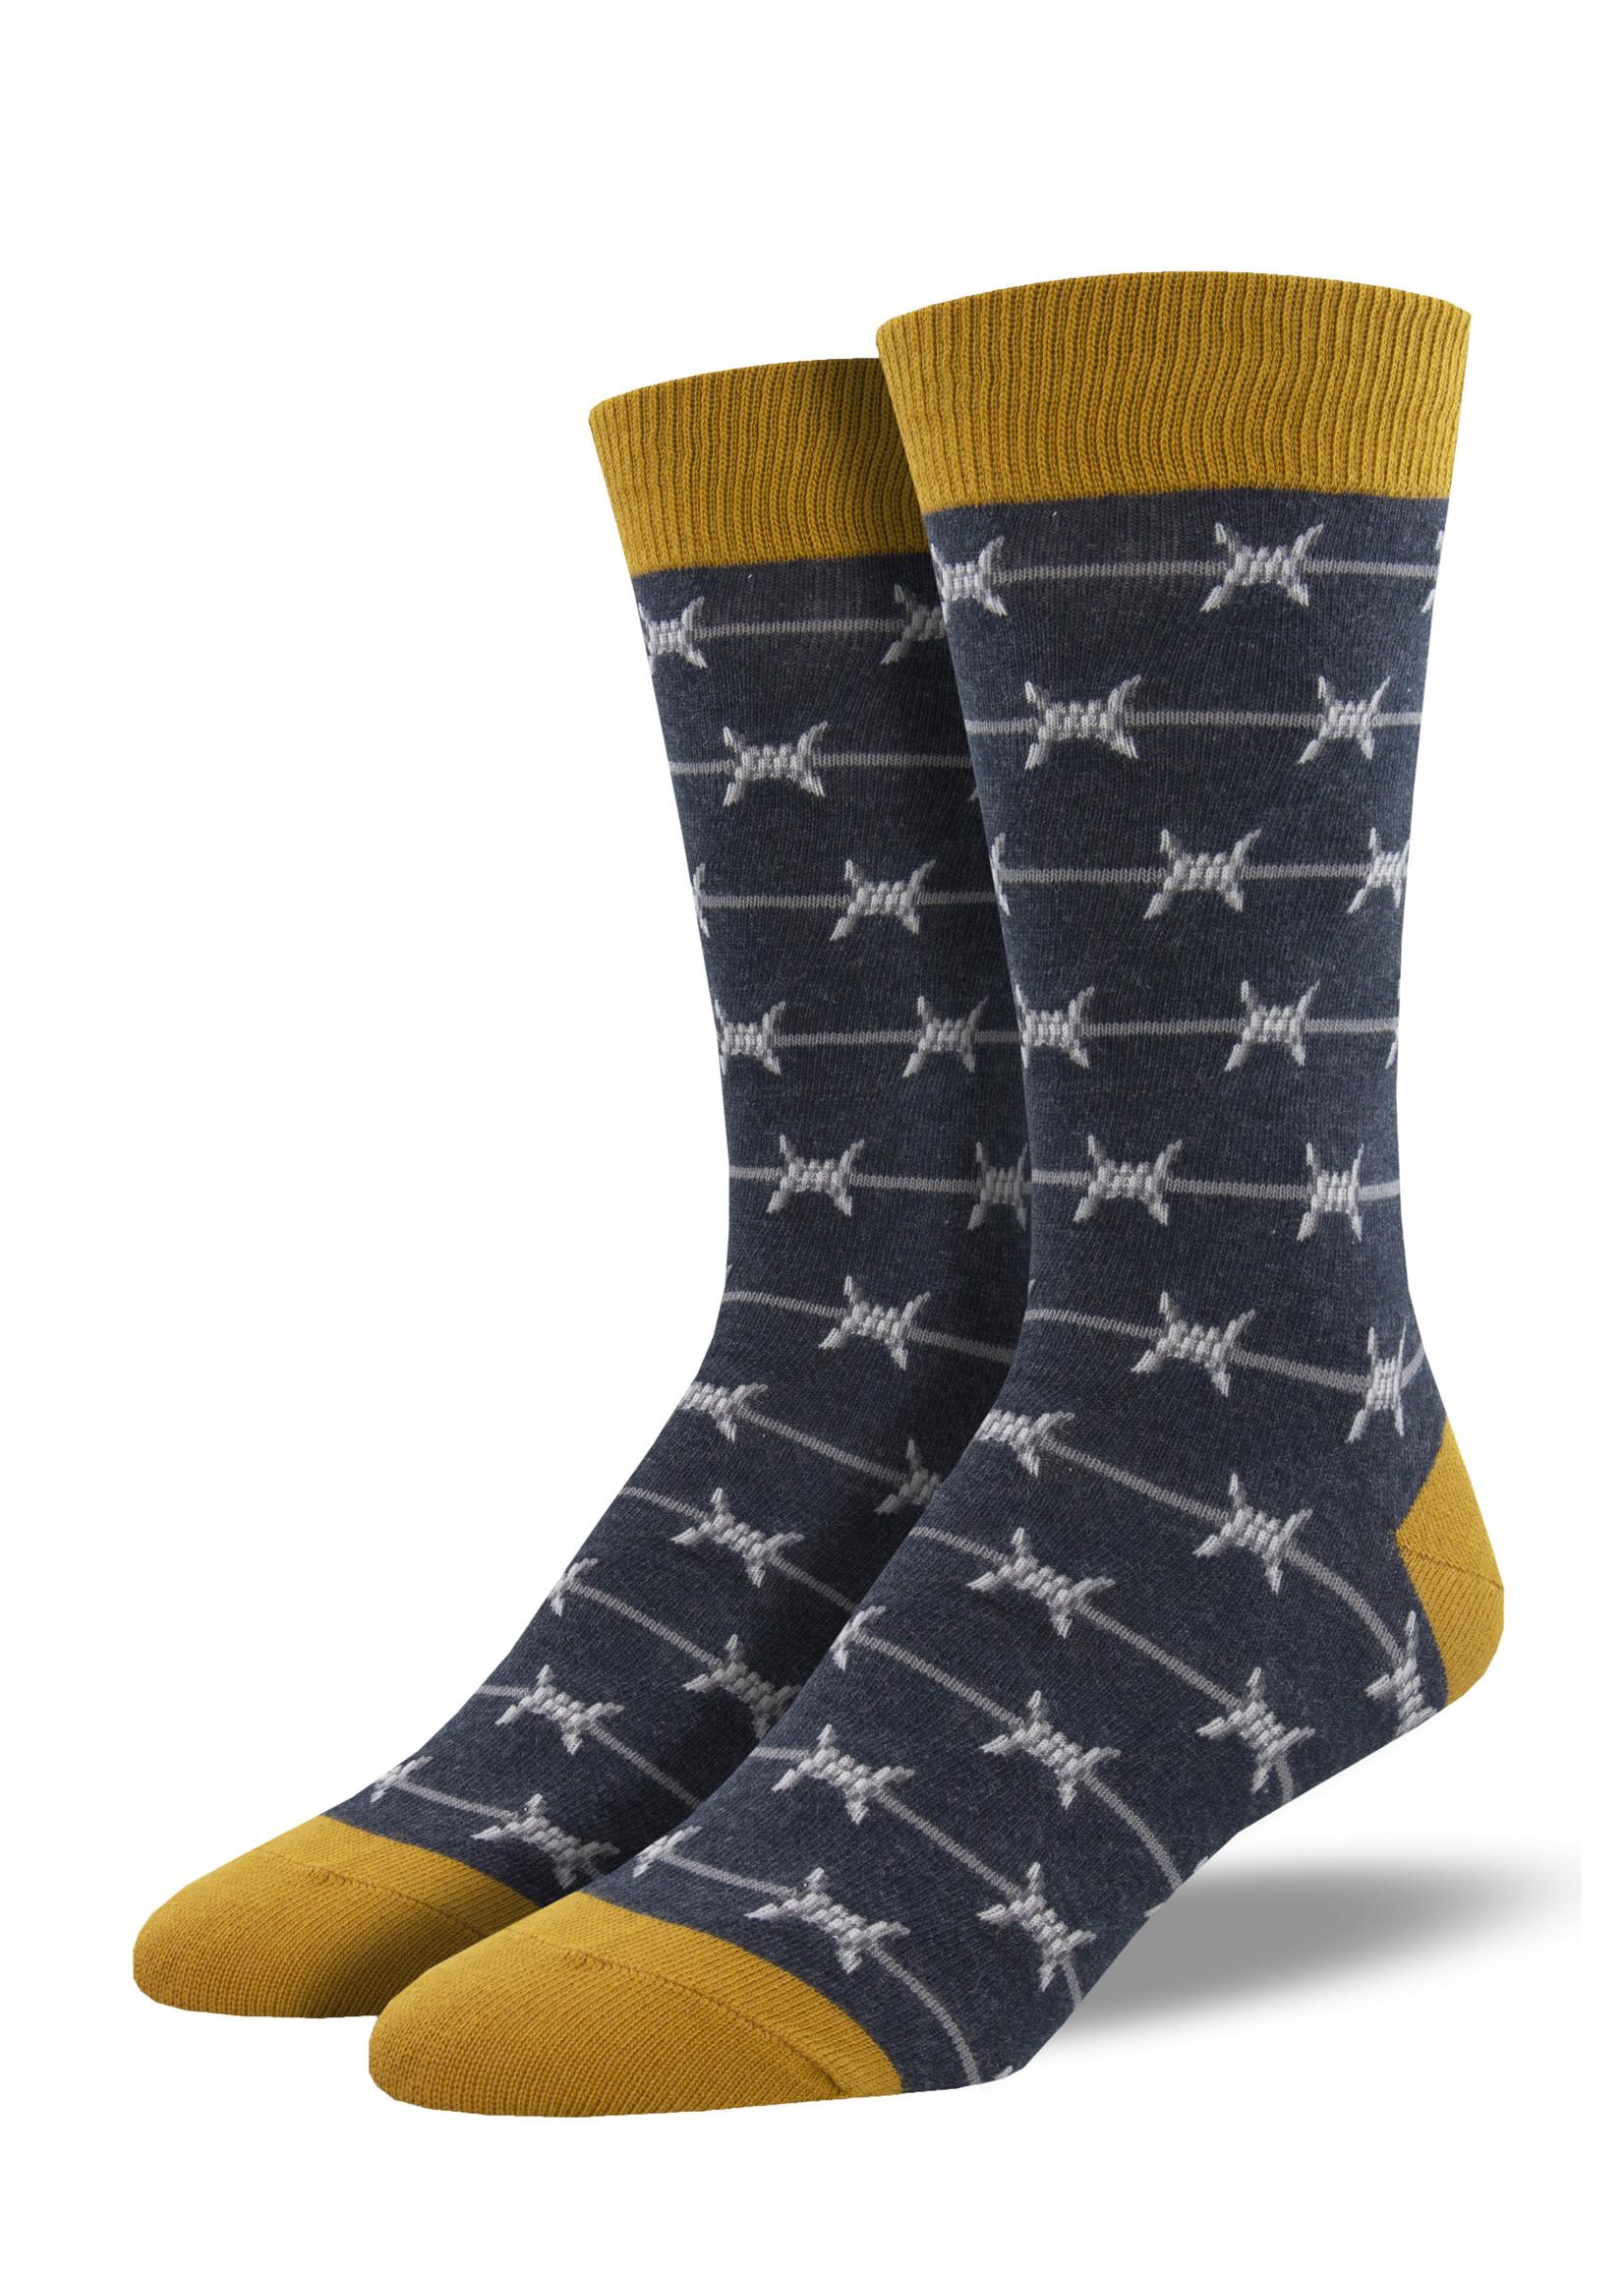 Socksmith Canada Inc MEN'S KEEP OUT SOCKS